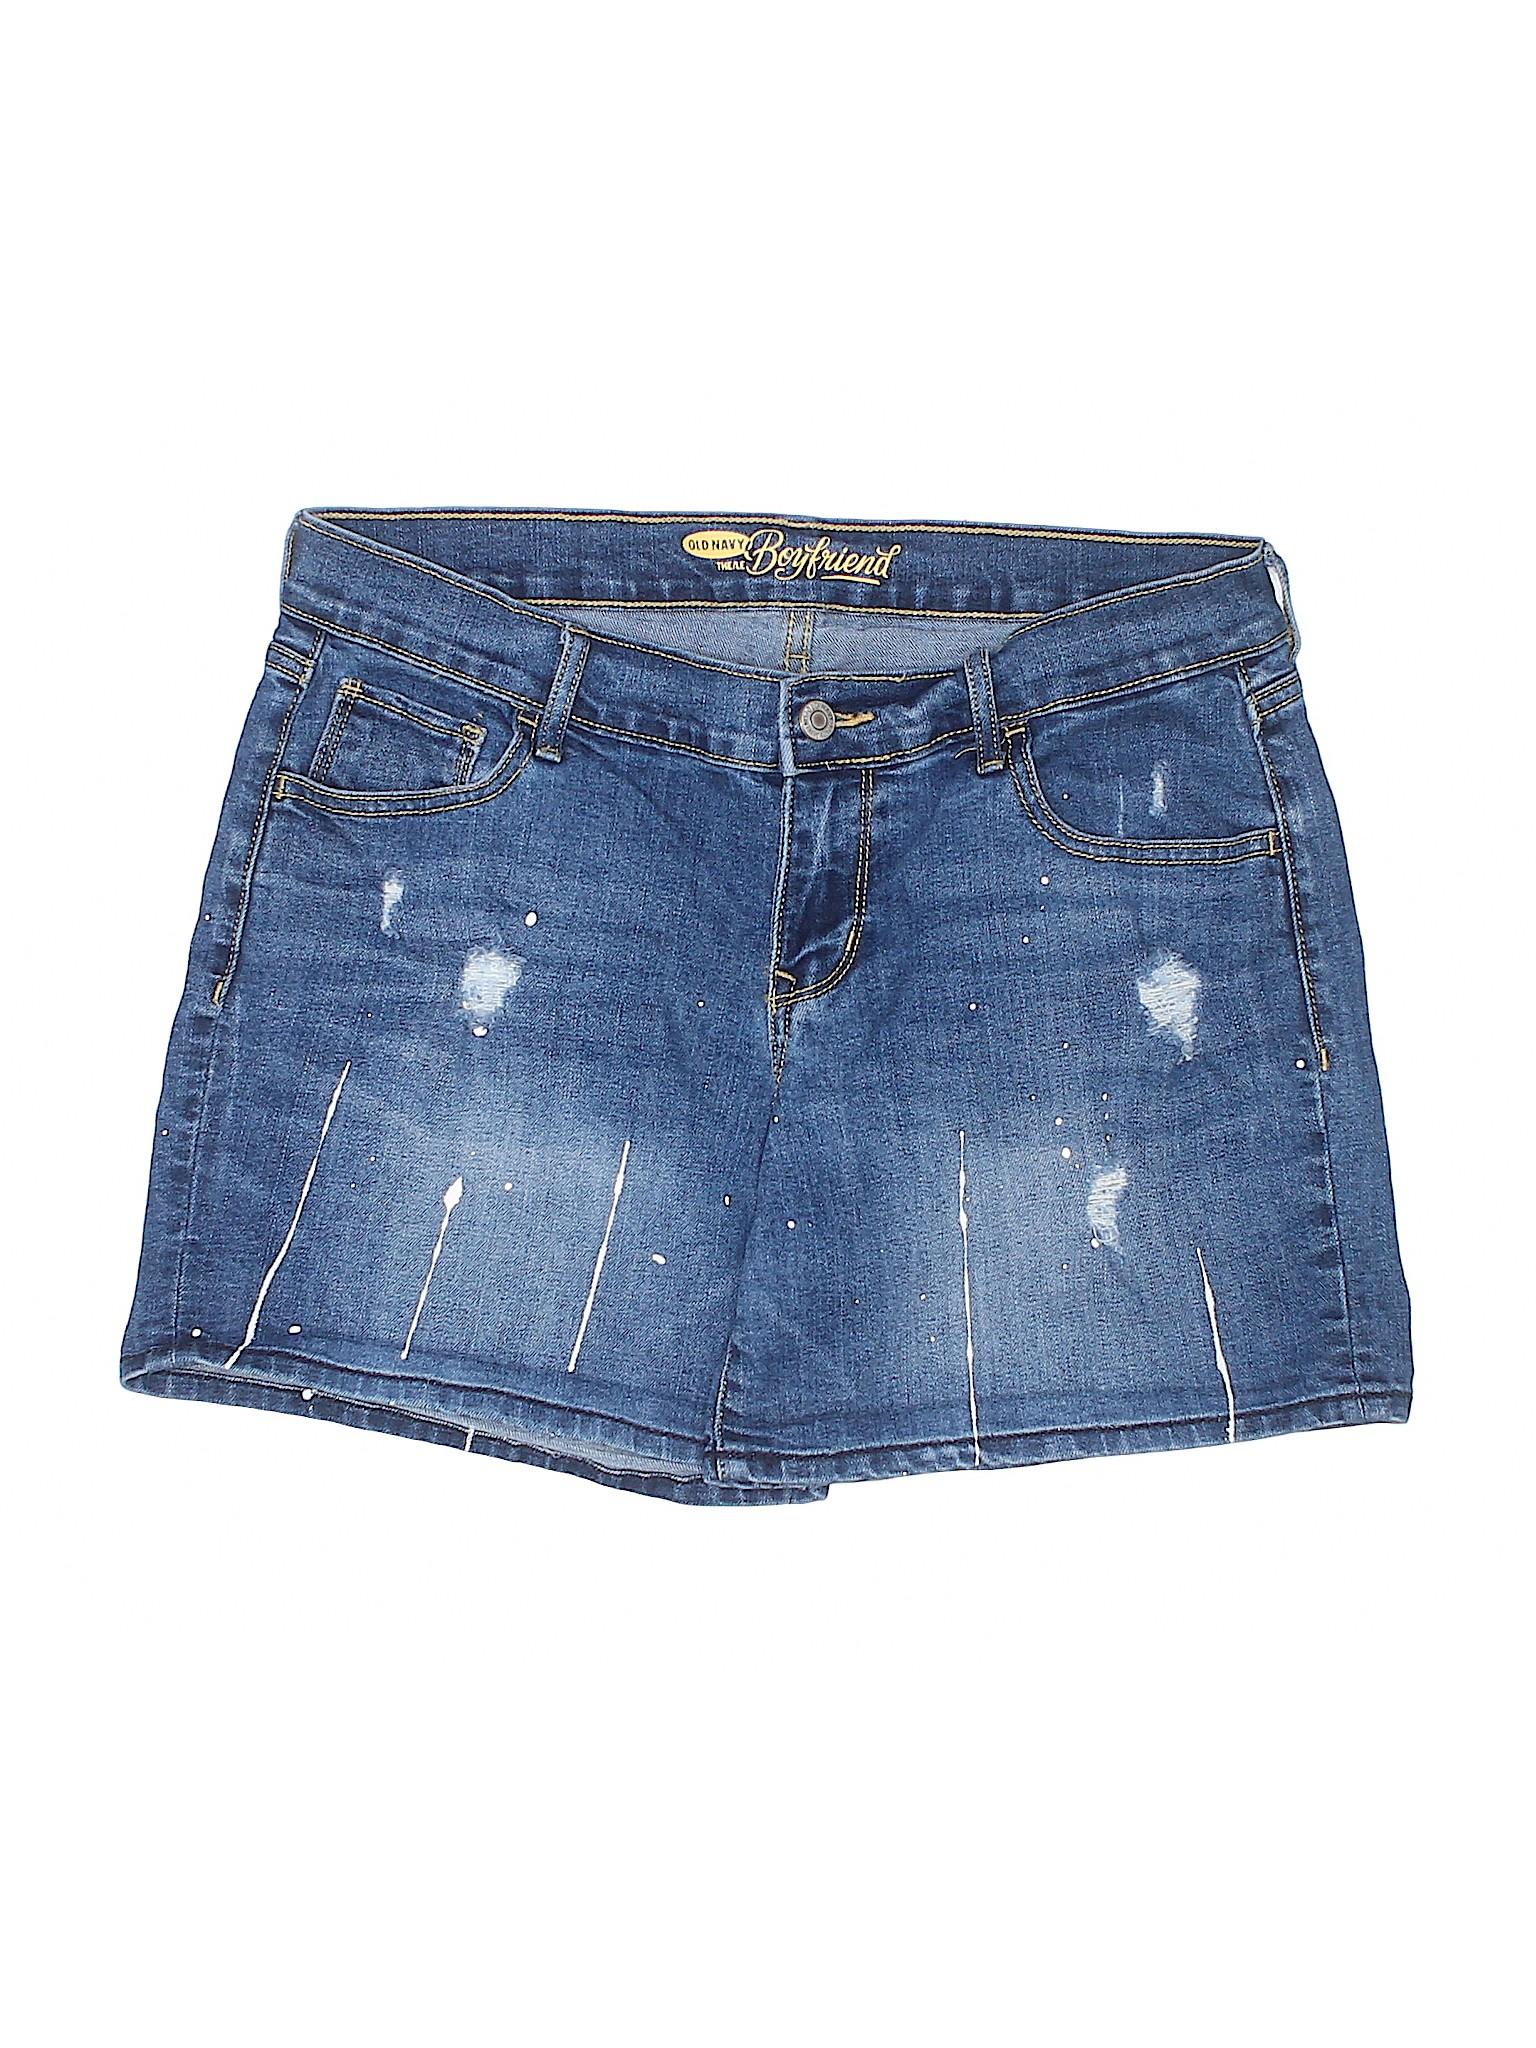 Shorts Boutique Denim Old Navy Old Navy Denim Shorts Boutique pqzwE8gOO1